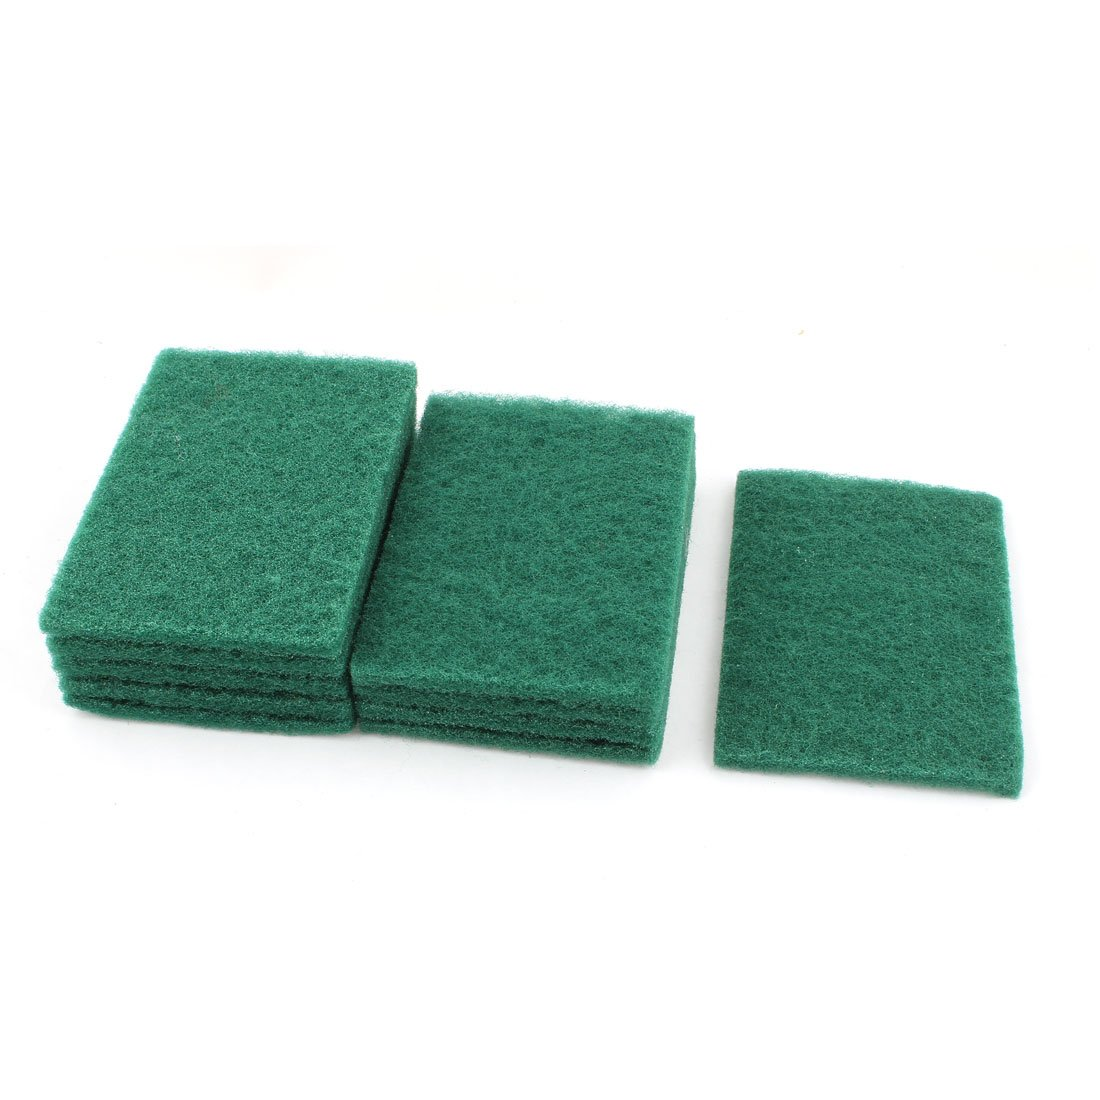 20 Pc Round Scouring Pads Sponge Wash Clean Kitchen Dishes Cleaner Scour Scrub